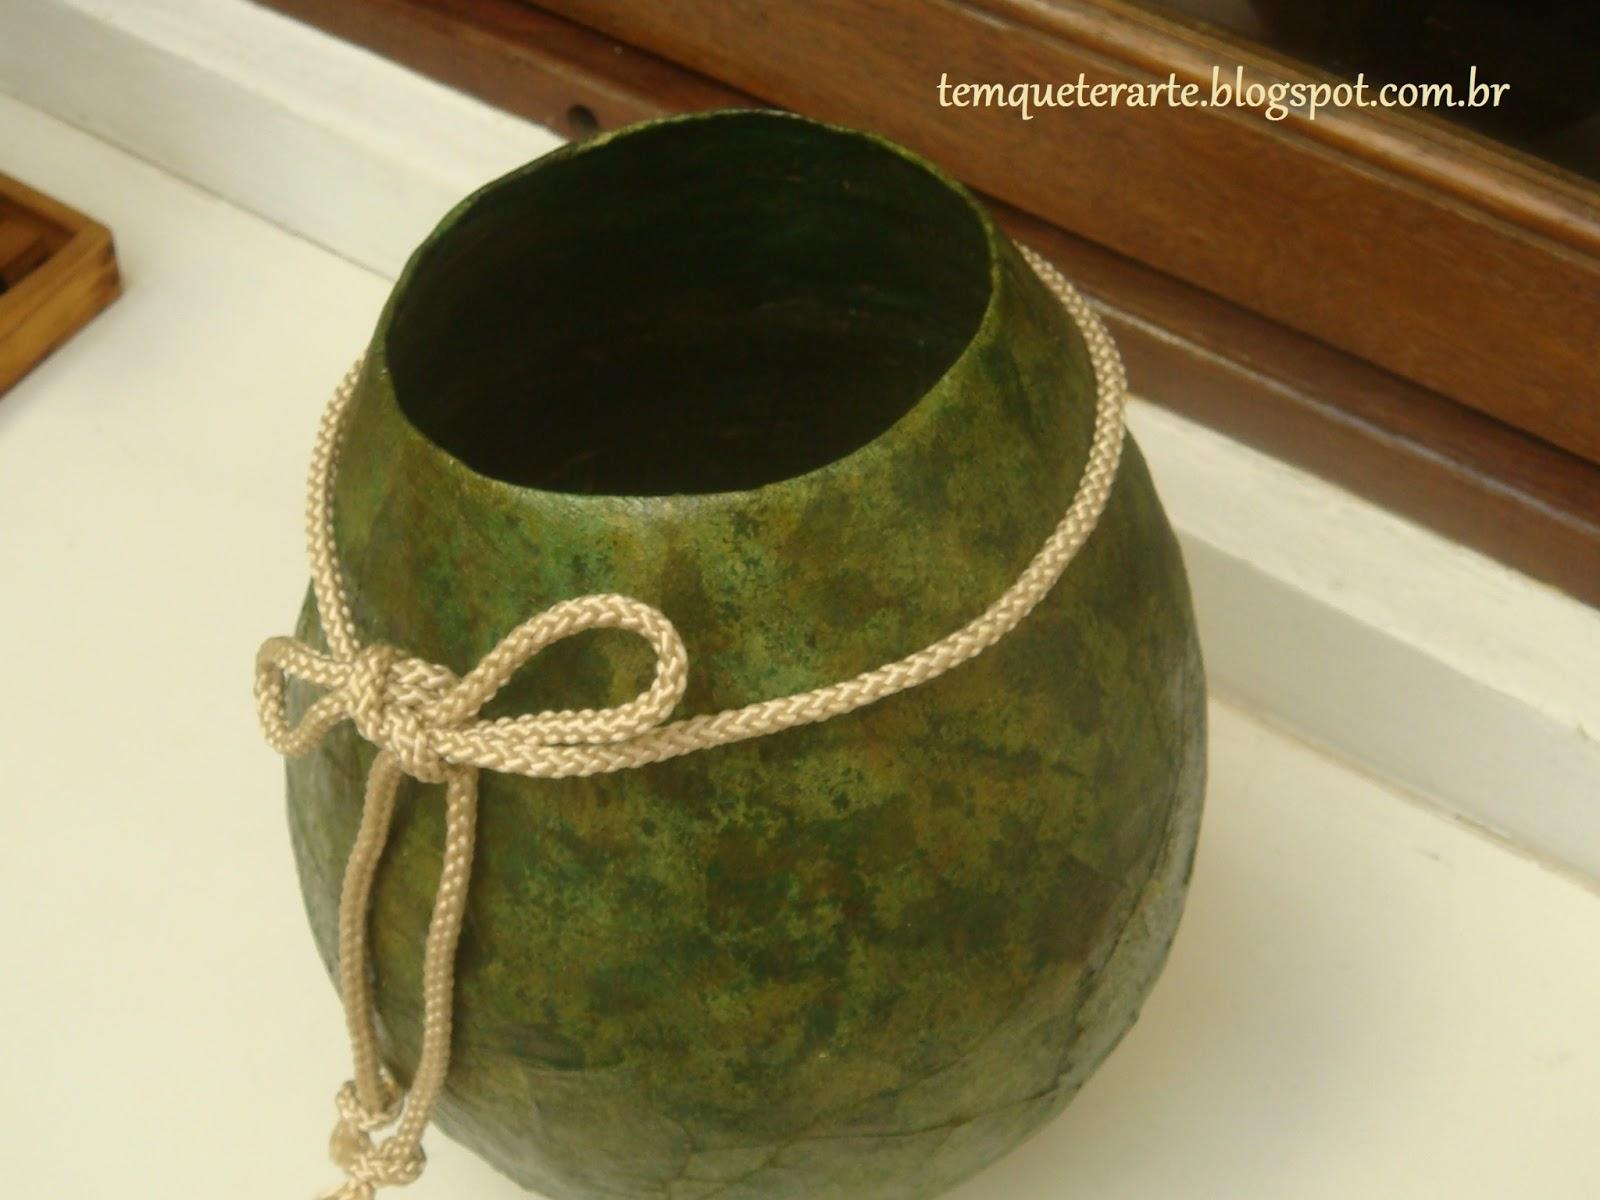 Armario Rustico Colonial ~ Vaso feito de bexiga e jornal u2013 Artesanato na